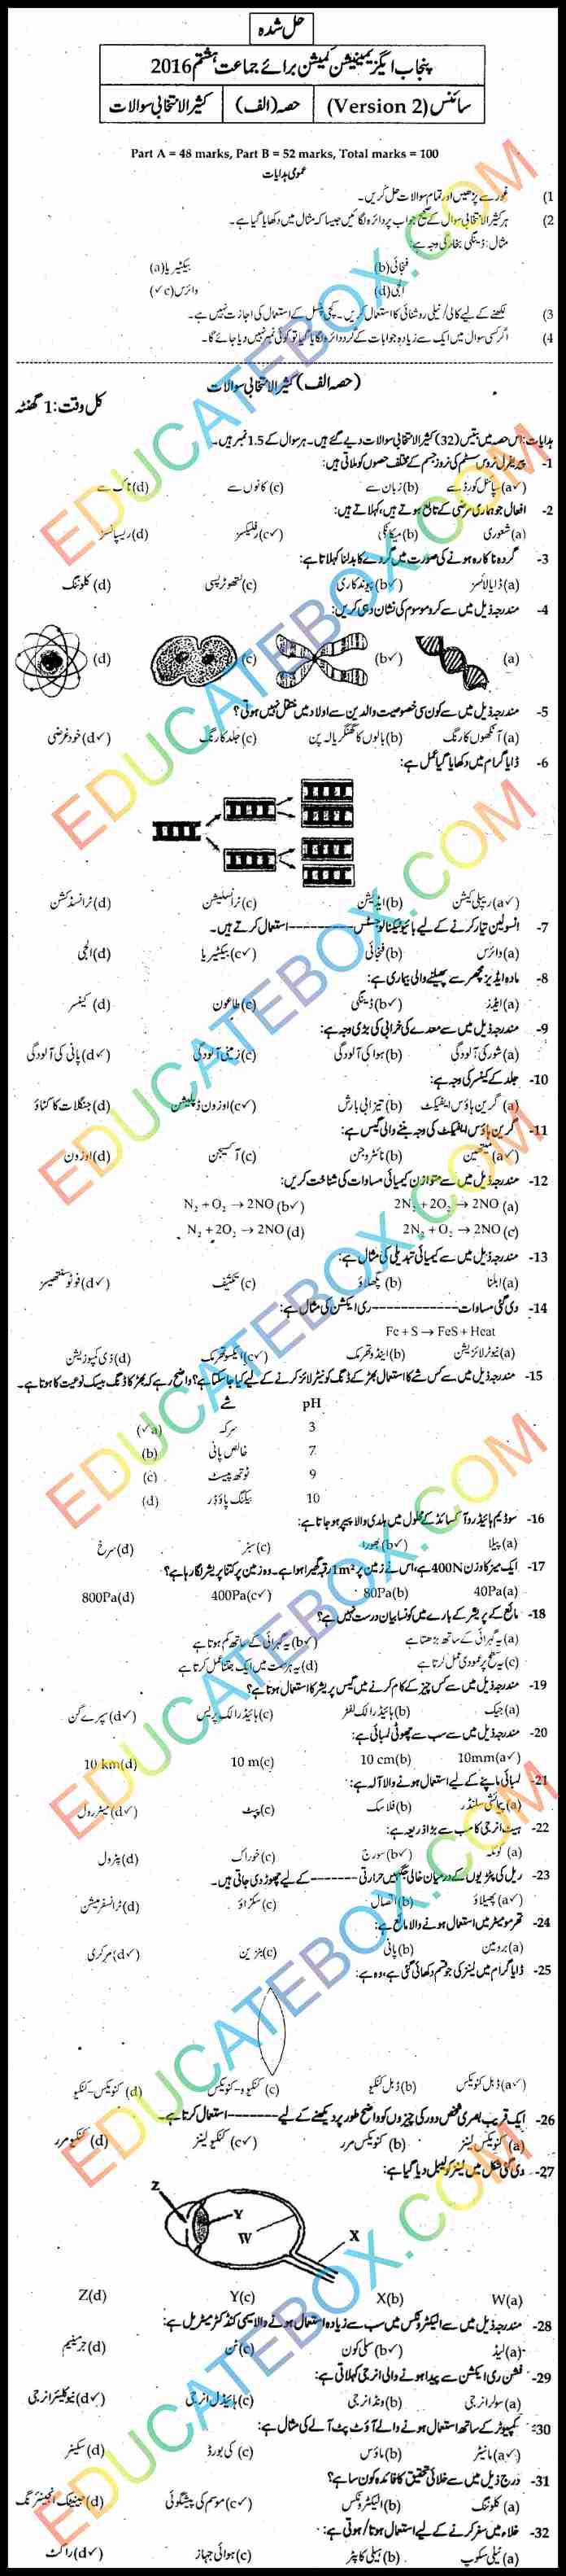 Past Paper 8th Class Science 2016 Solved Paper (Urdu medium) Punjab Board (PEC) Objective Type Version 2 اپ ٹو ڈیٹ پیپر آٹھویں کلاس سائنس 2016 حل شدہ پیپر پنجاب بورڈ اوبجیکٹیو ٹائپ۔ ورژن2